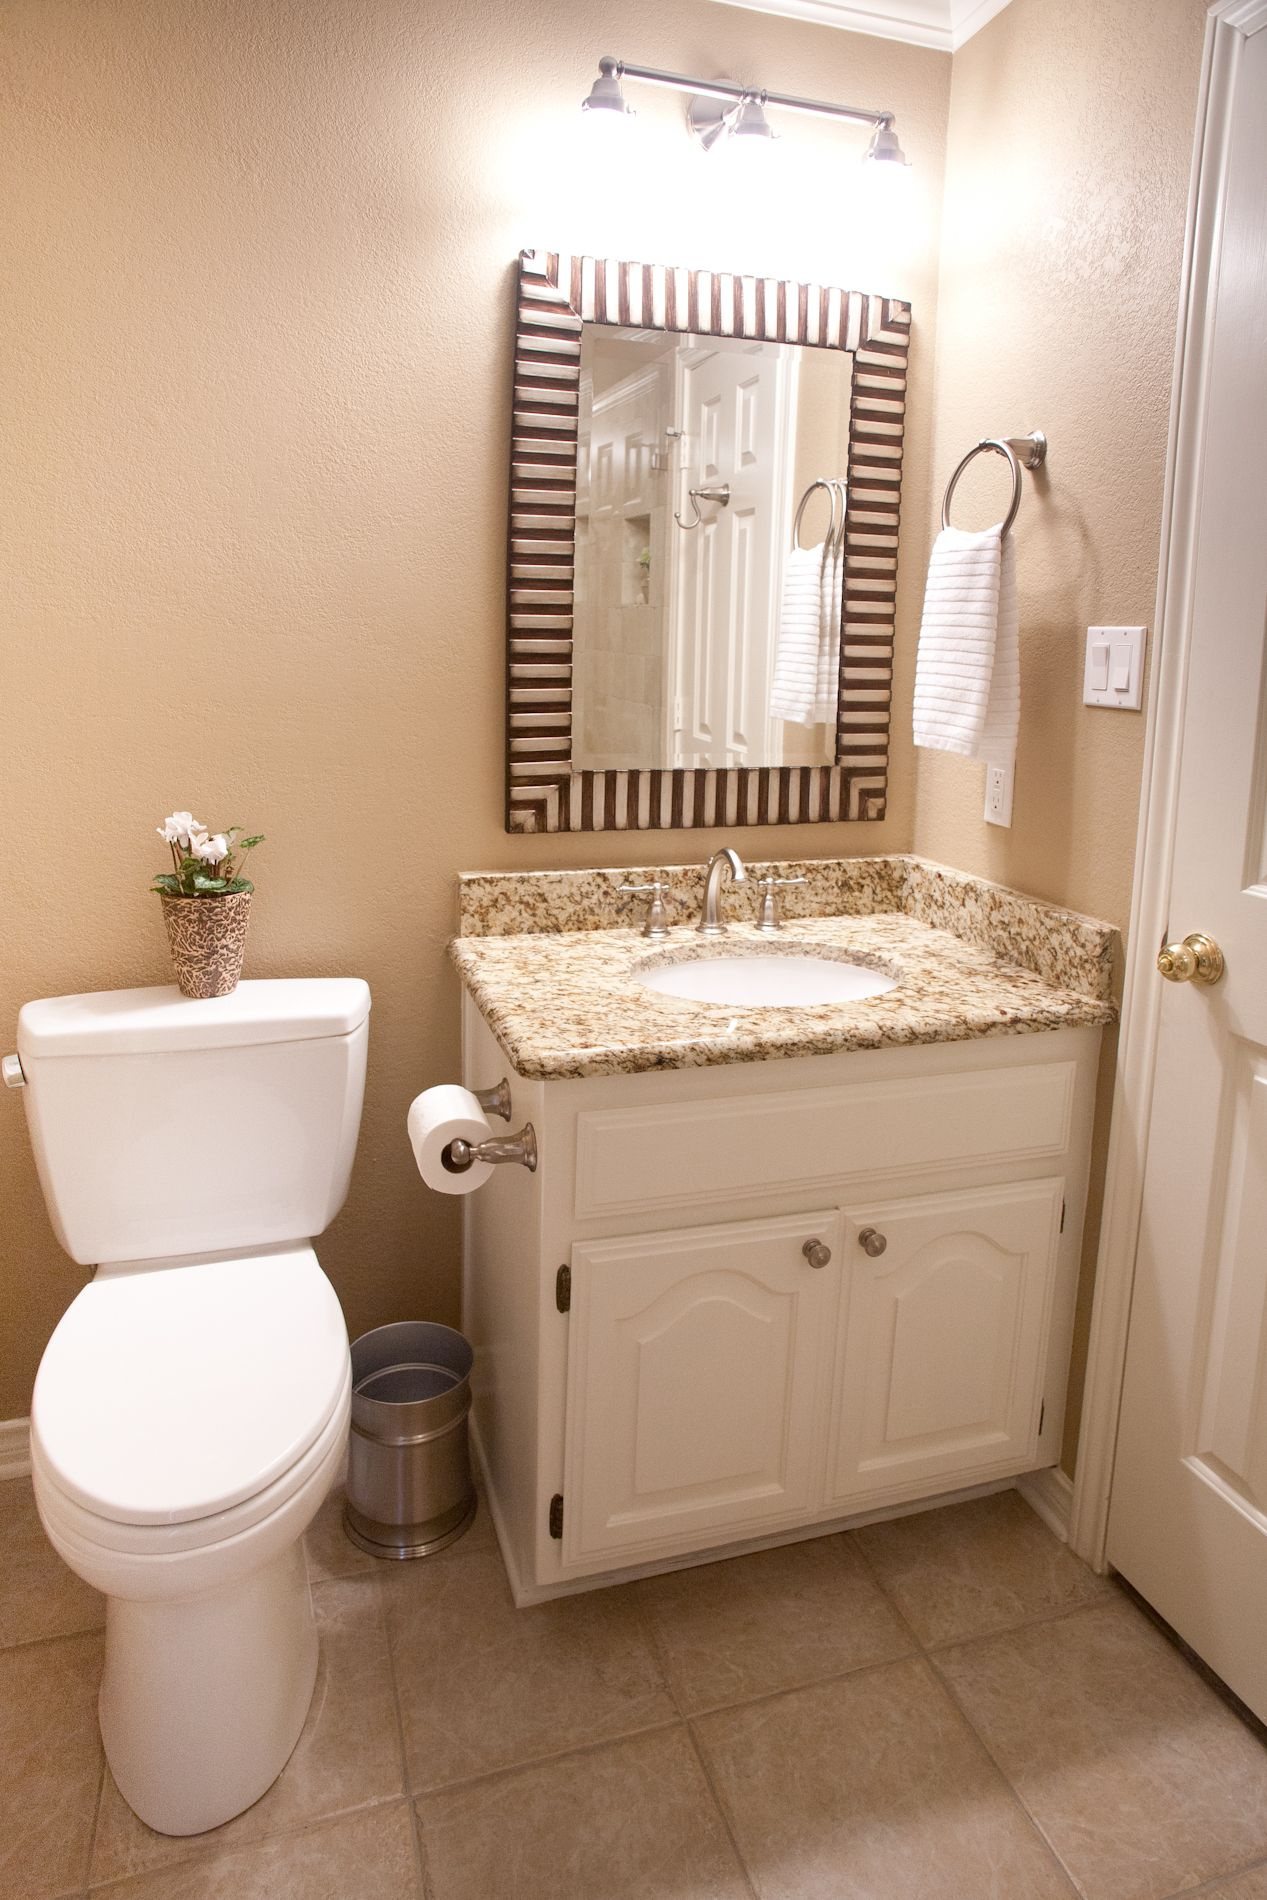 Toto sink | Kohler Kelston faucet in brushed nickel | Carrollton ...